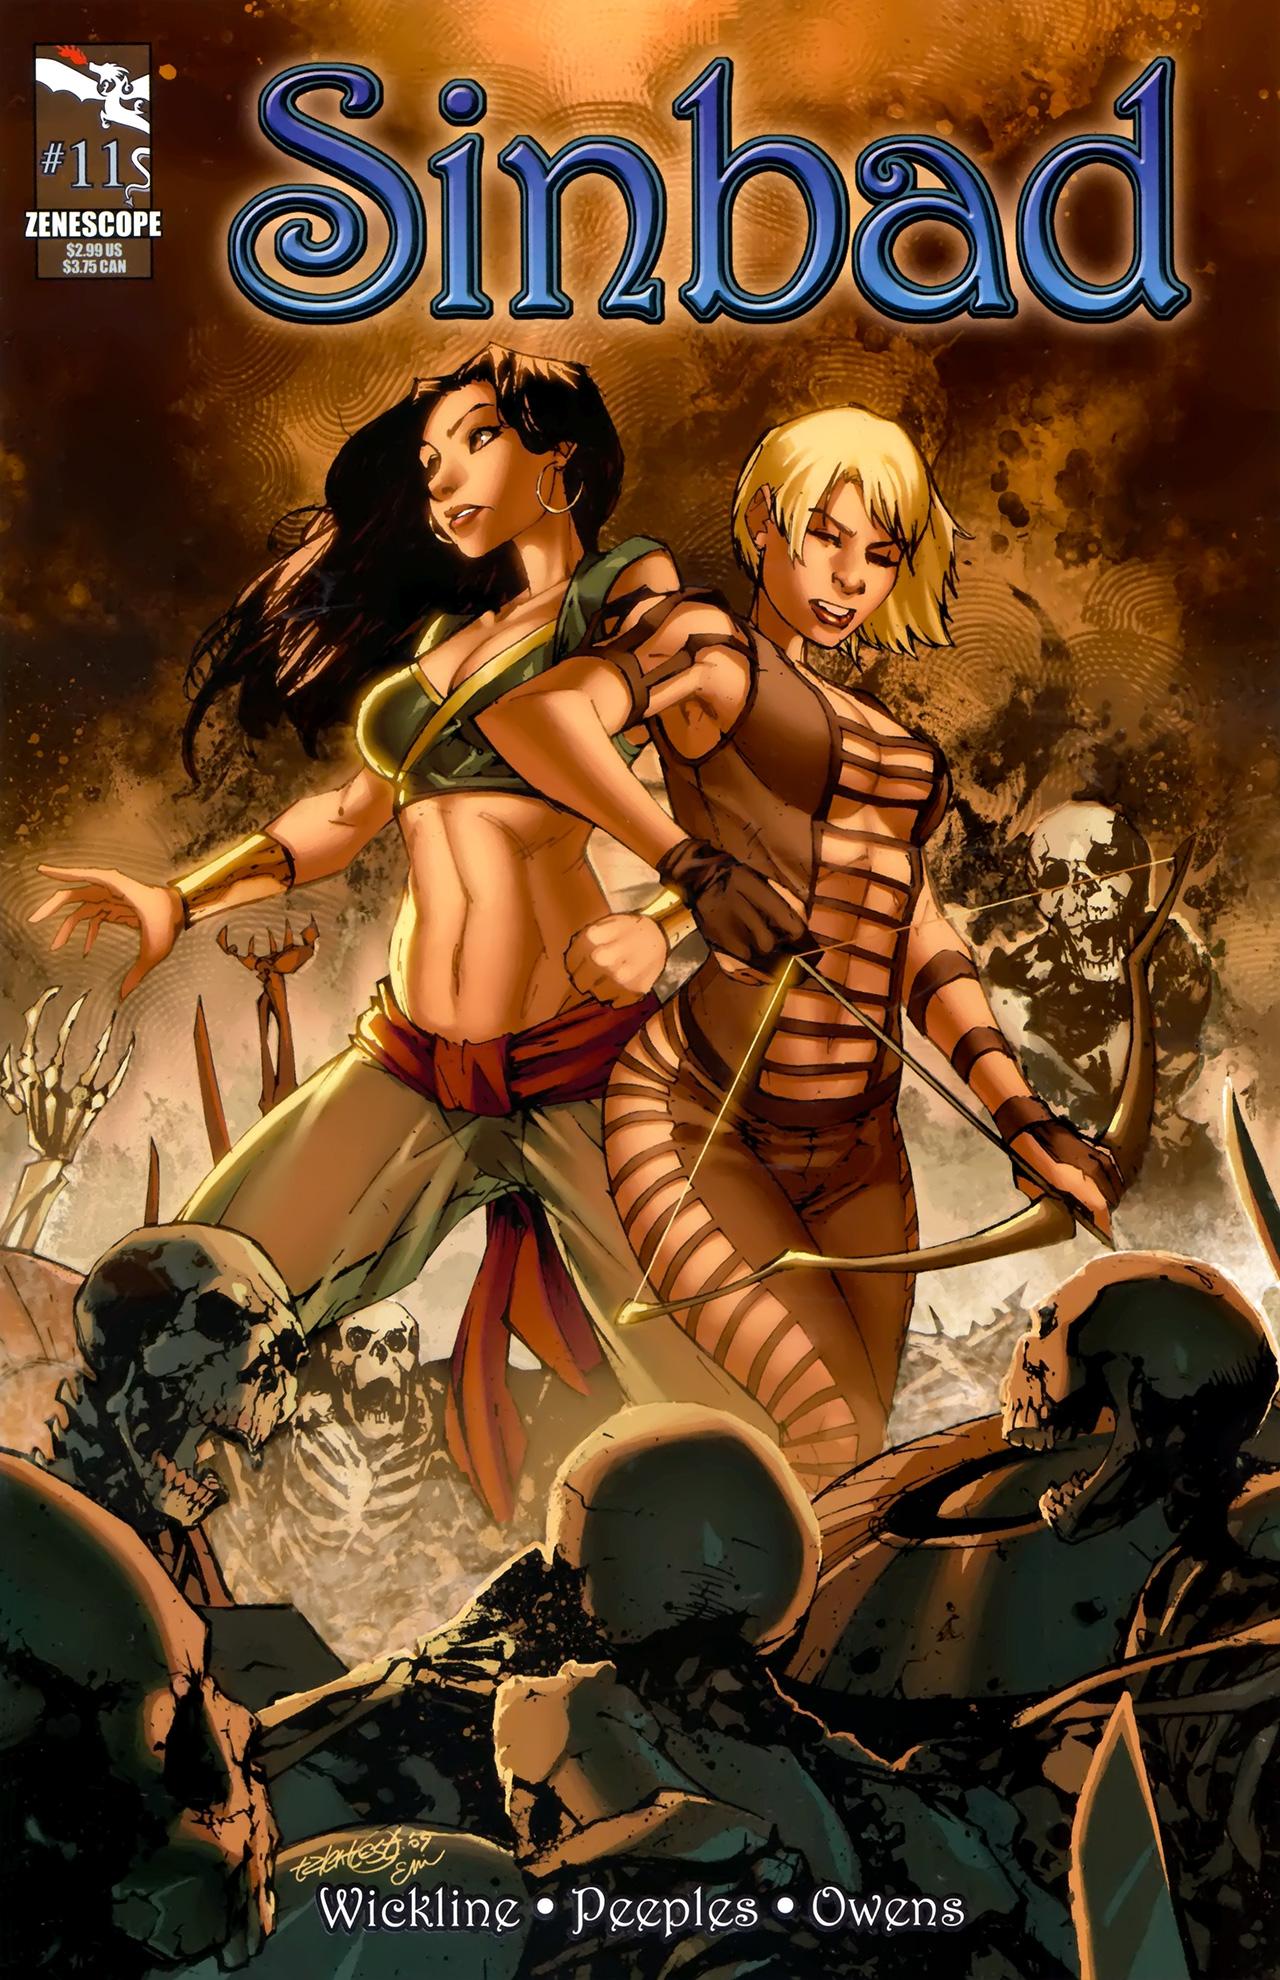 1001 Arabian Nights: The Adventures of Sinbad 11 Page 1